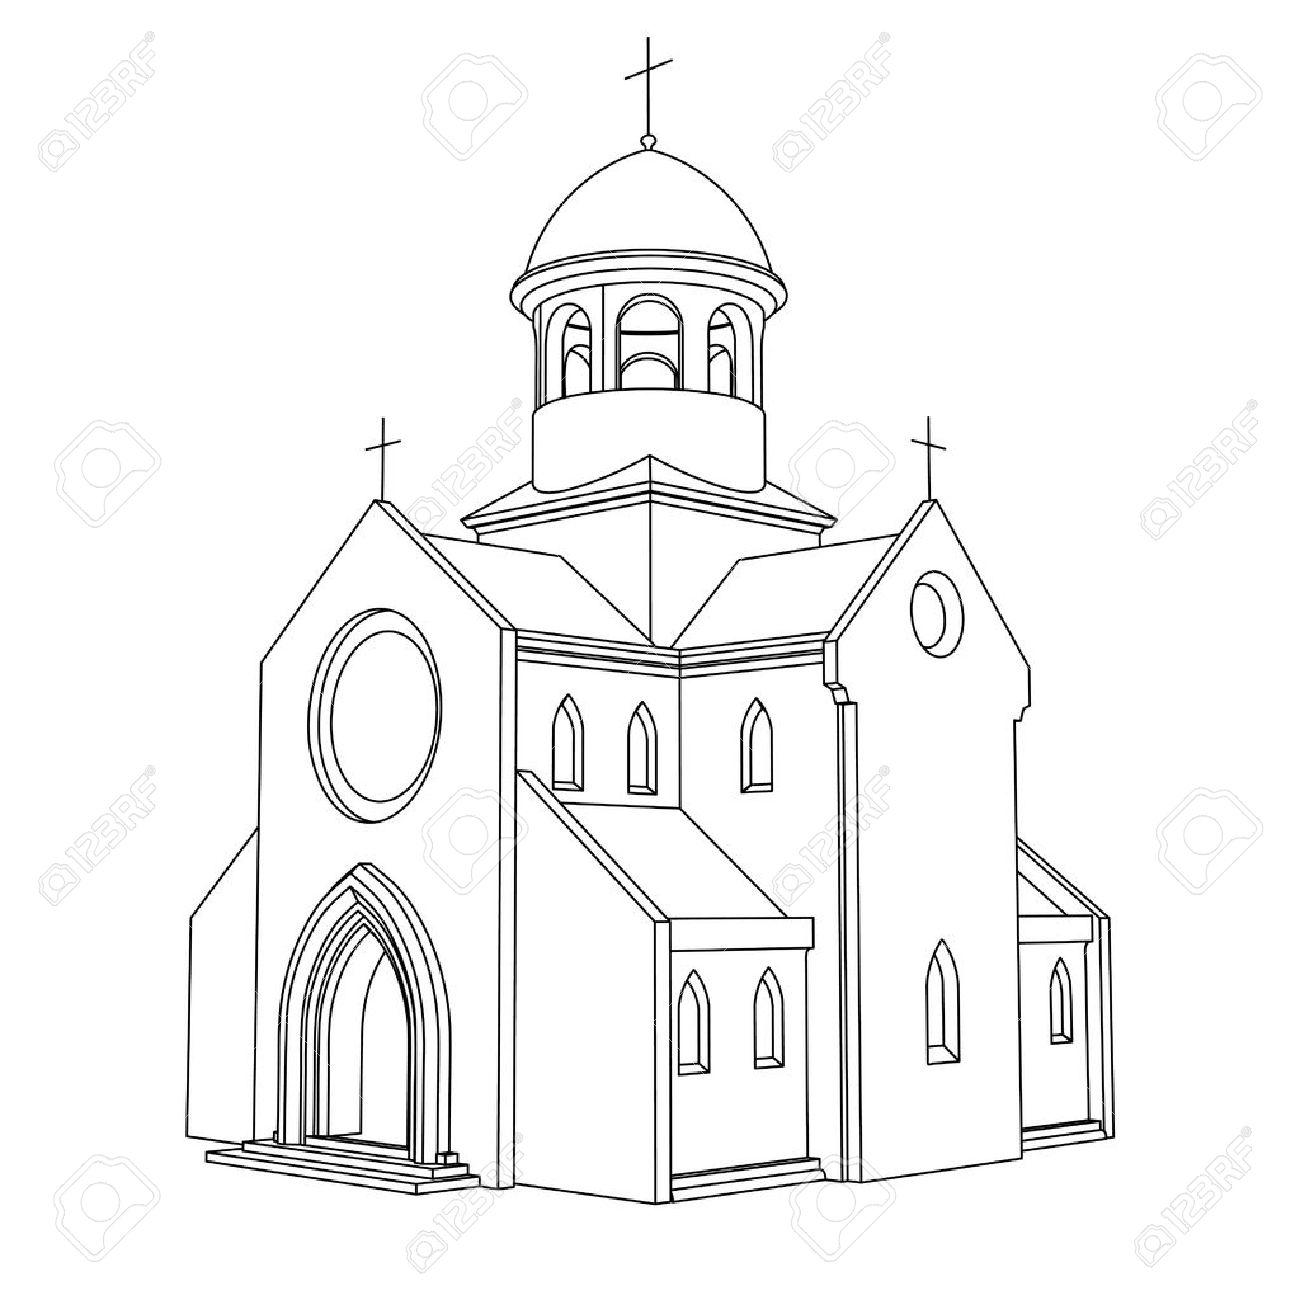 Church clipart sketch, Church sketch Transparent FREE for